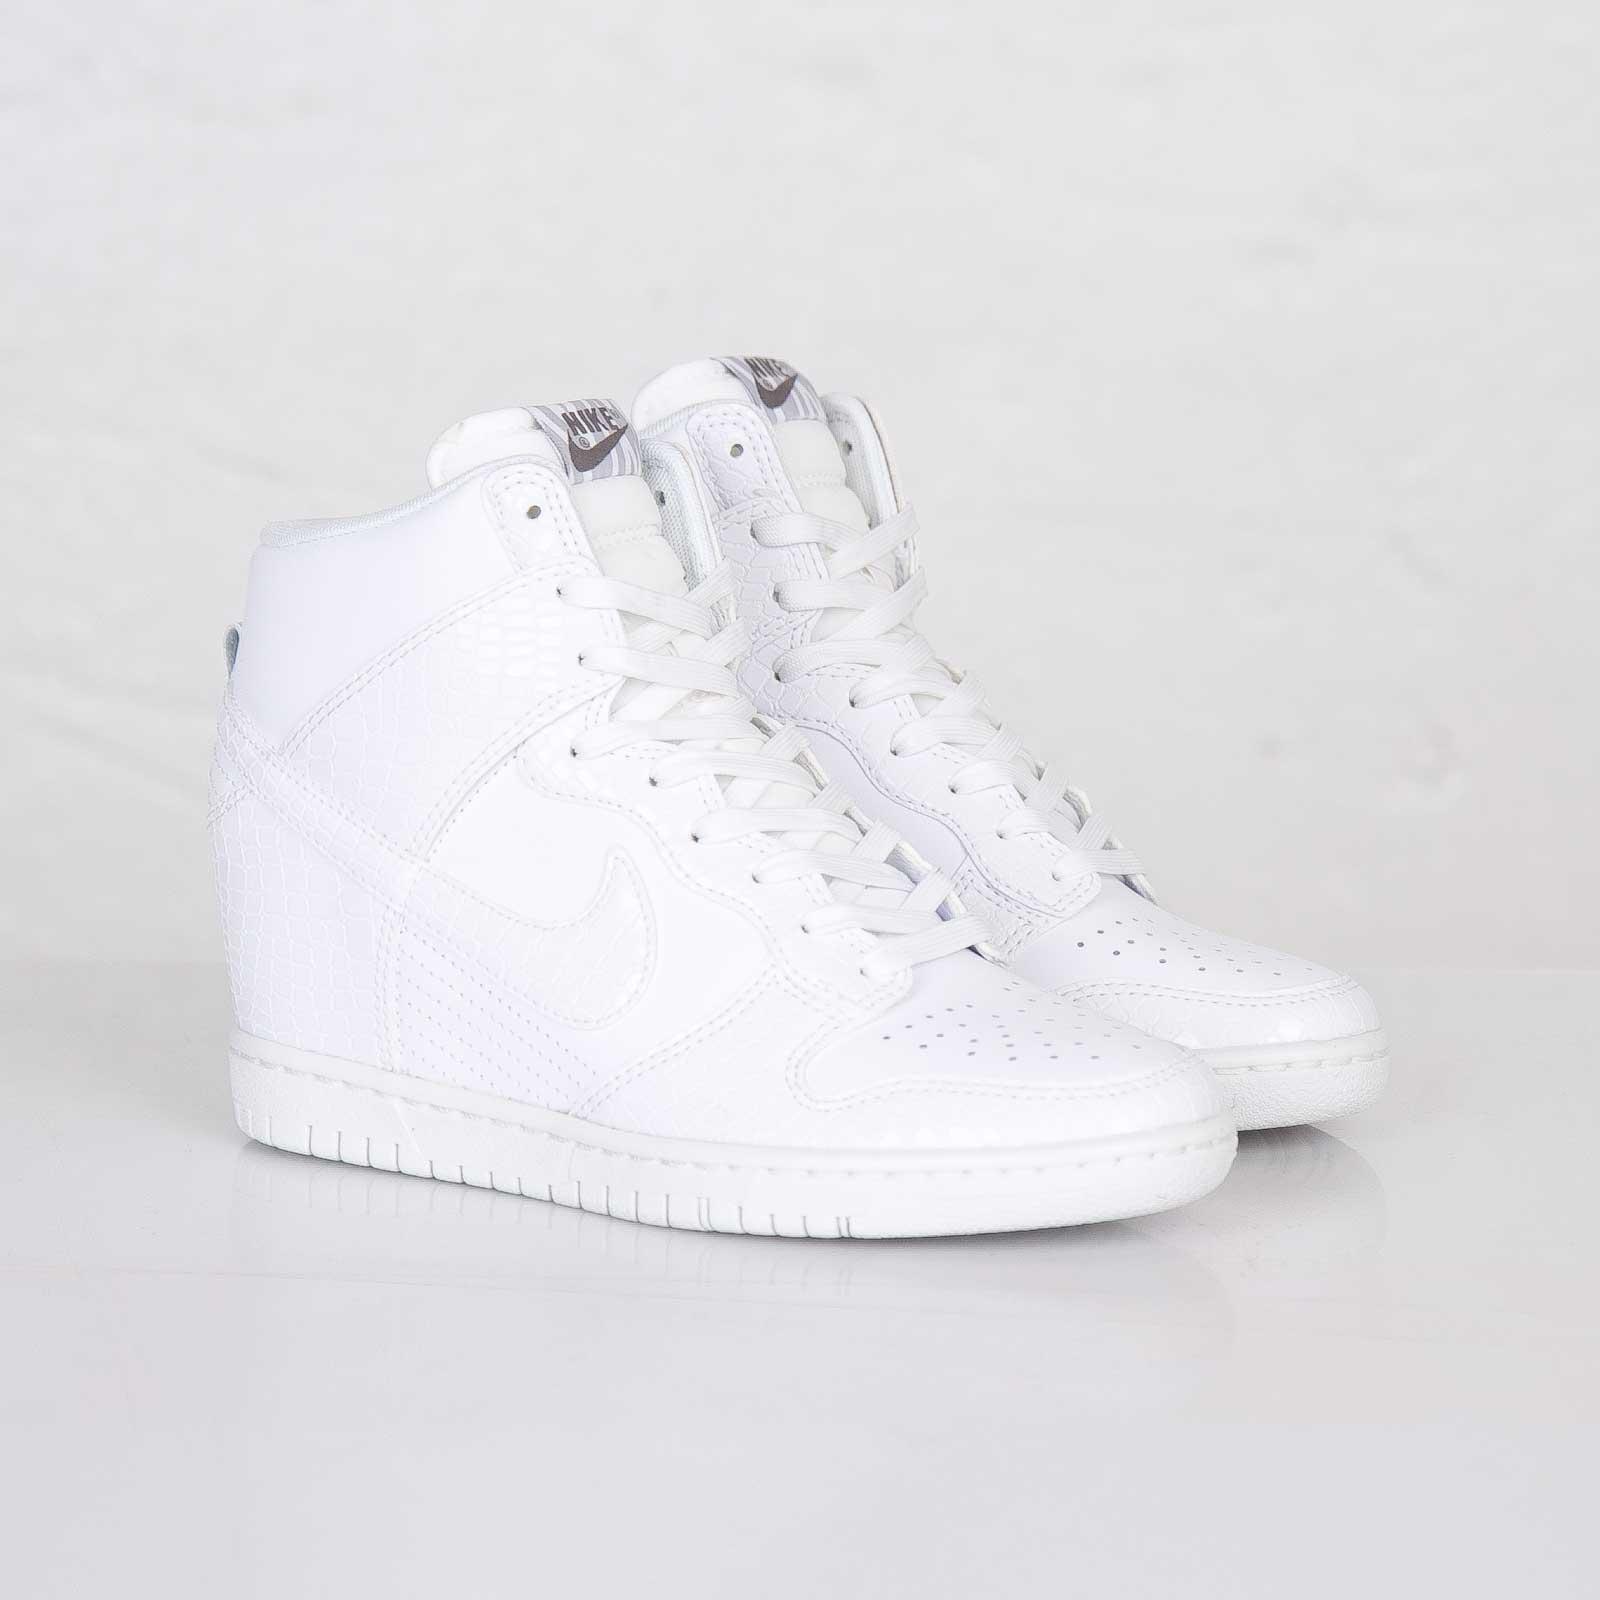 Nike Wmns Dunk Sky Hi - 528899-105 - Sneakersnstuff  911349dc66